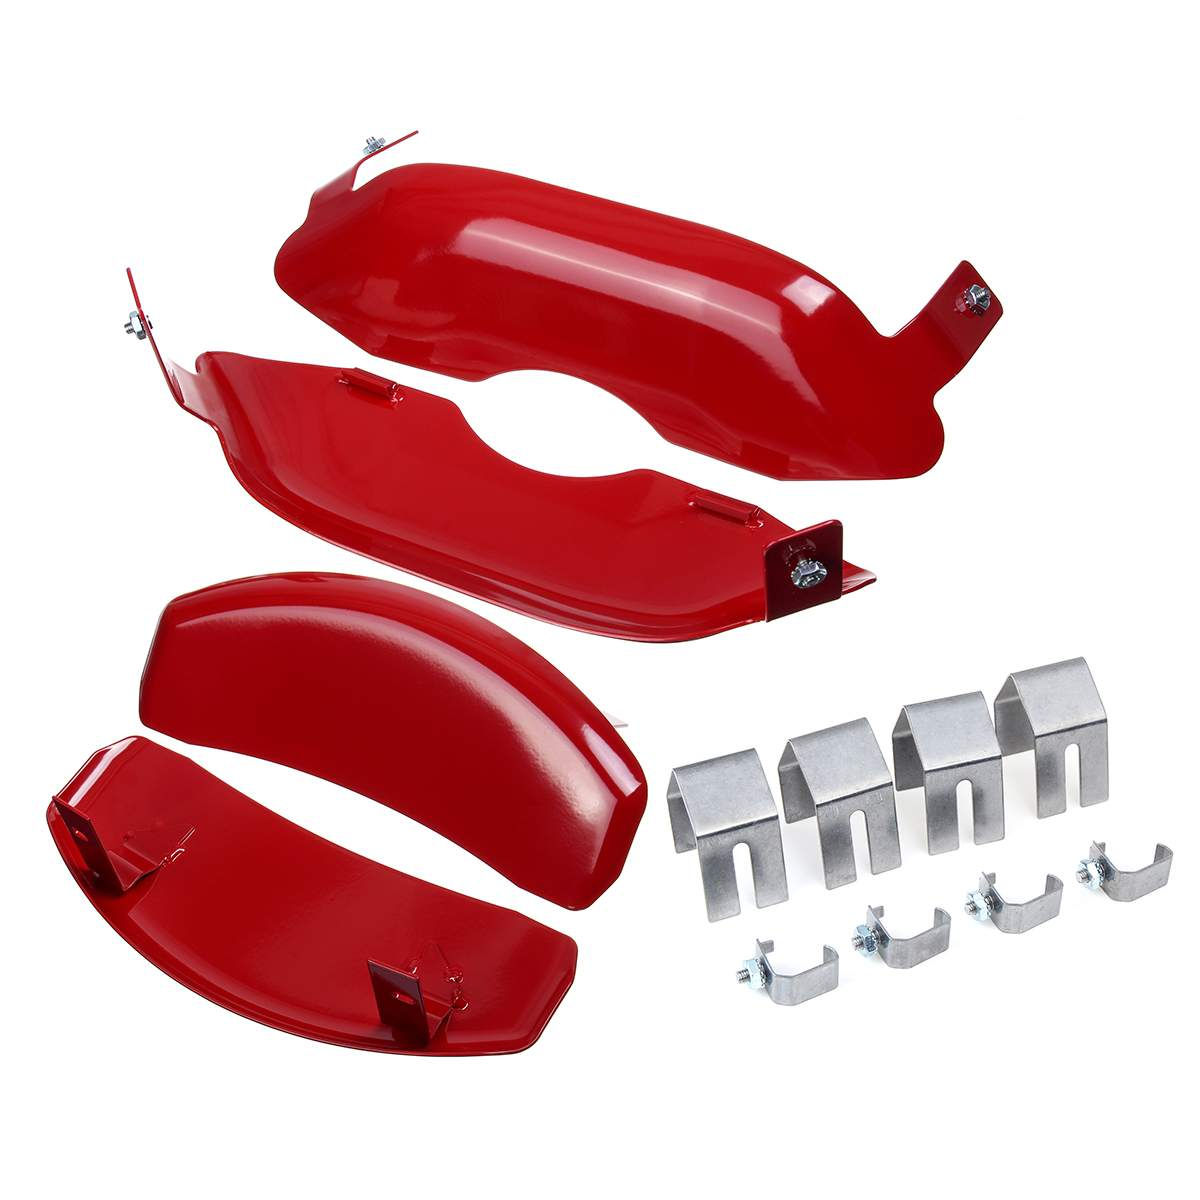 4pcs רכב דיסק בלם Caliper כיסוי אדום קדמי אחורי בלם כיסוי אלומיניום עבור טסלה 3 2017-2019 בסיס /ארוך טווח